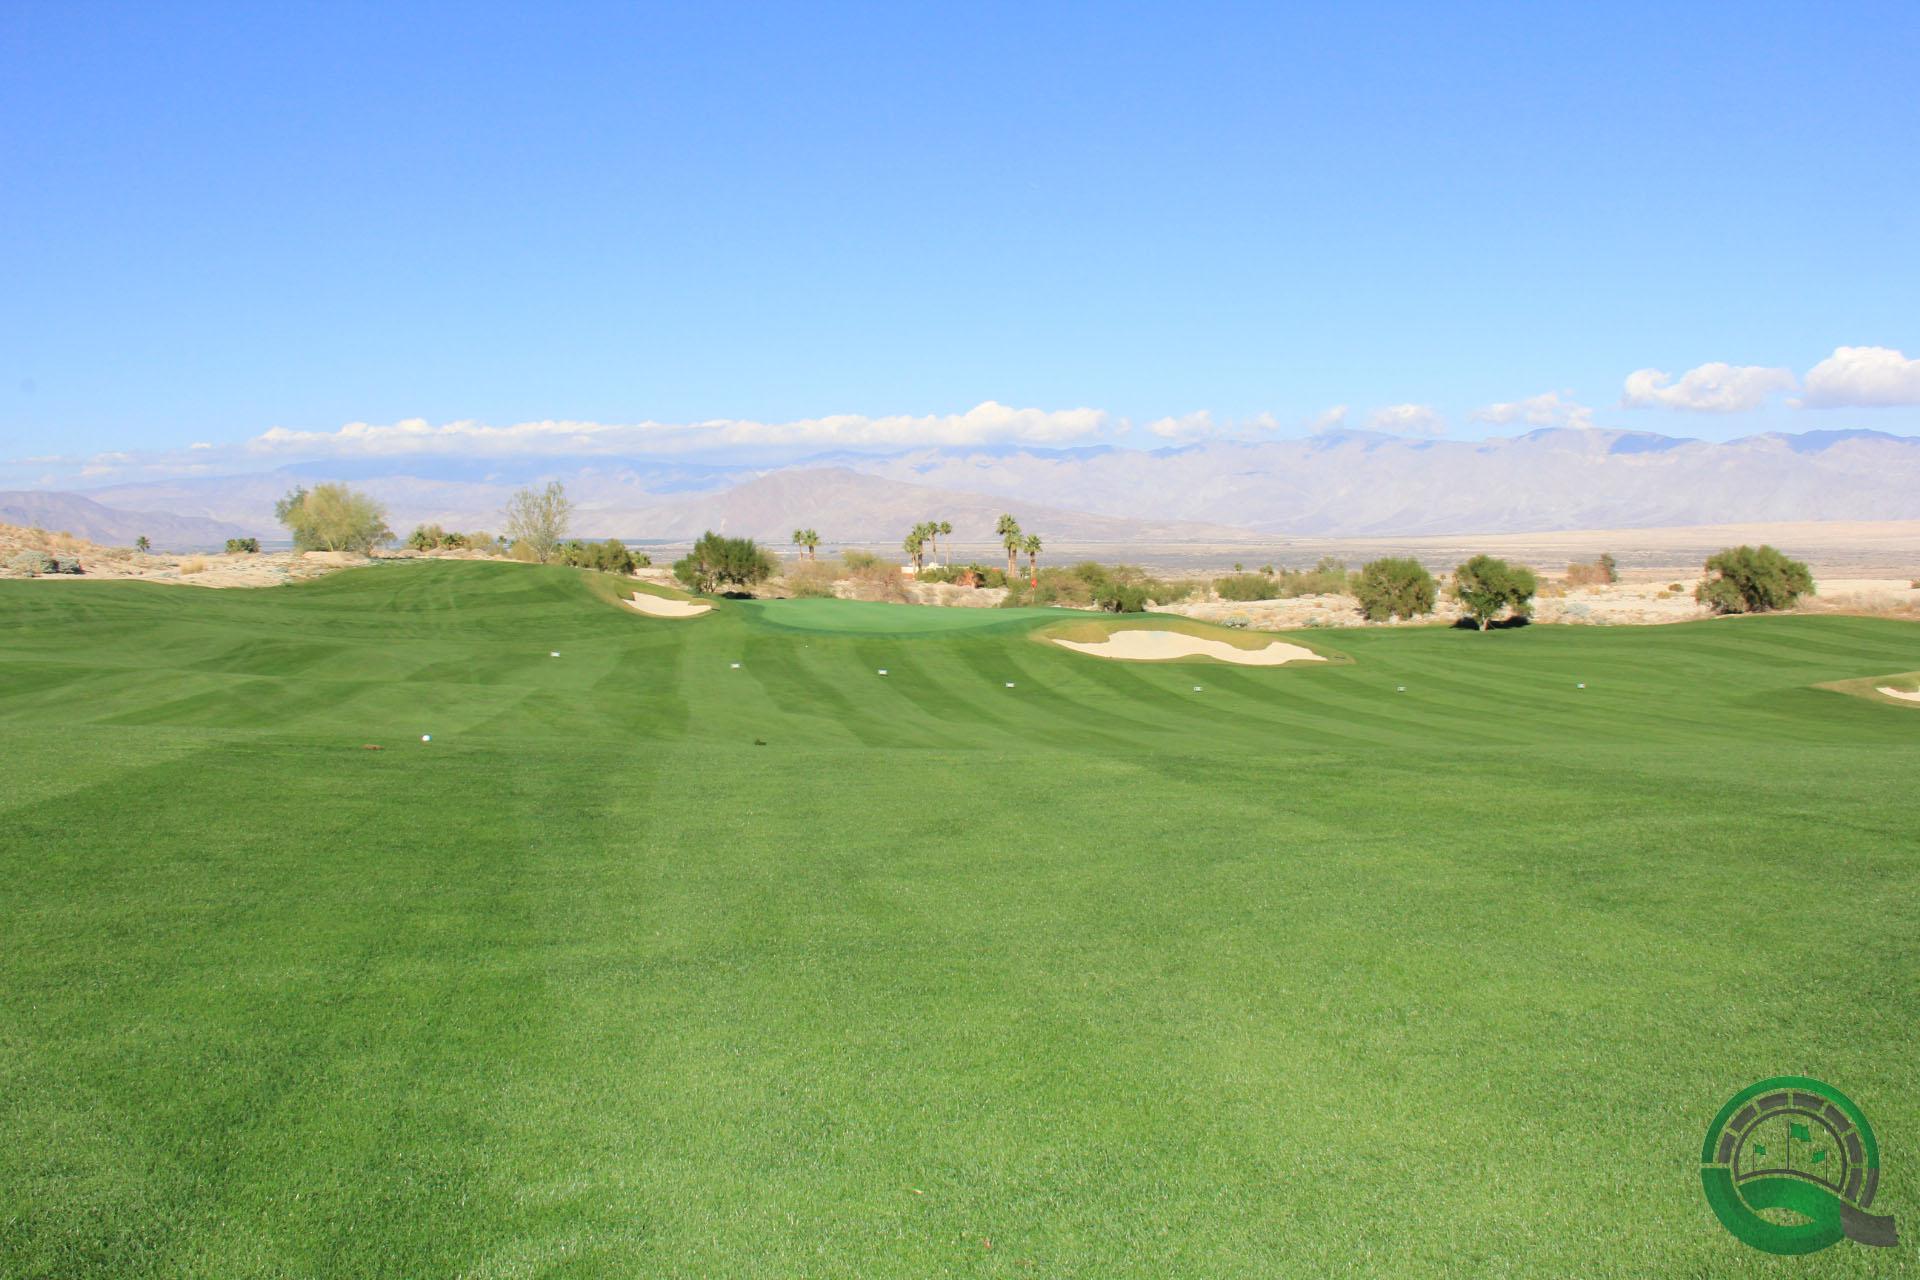 Rams Hill Golf Club Hole 7 Fairway